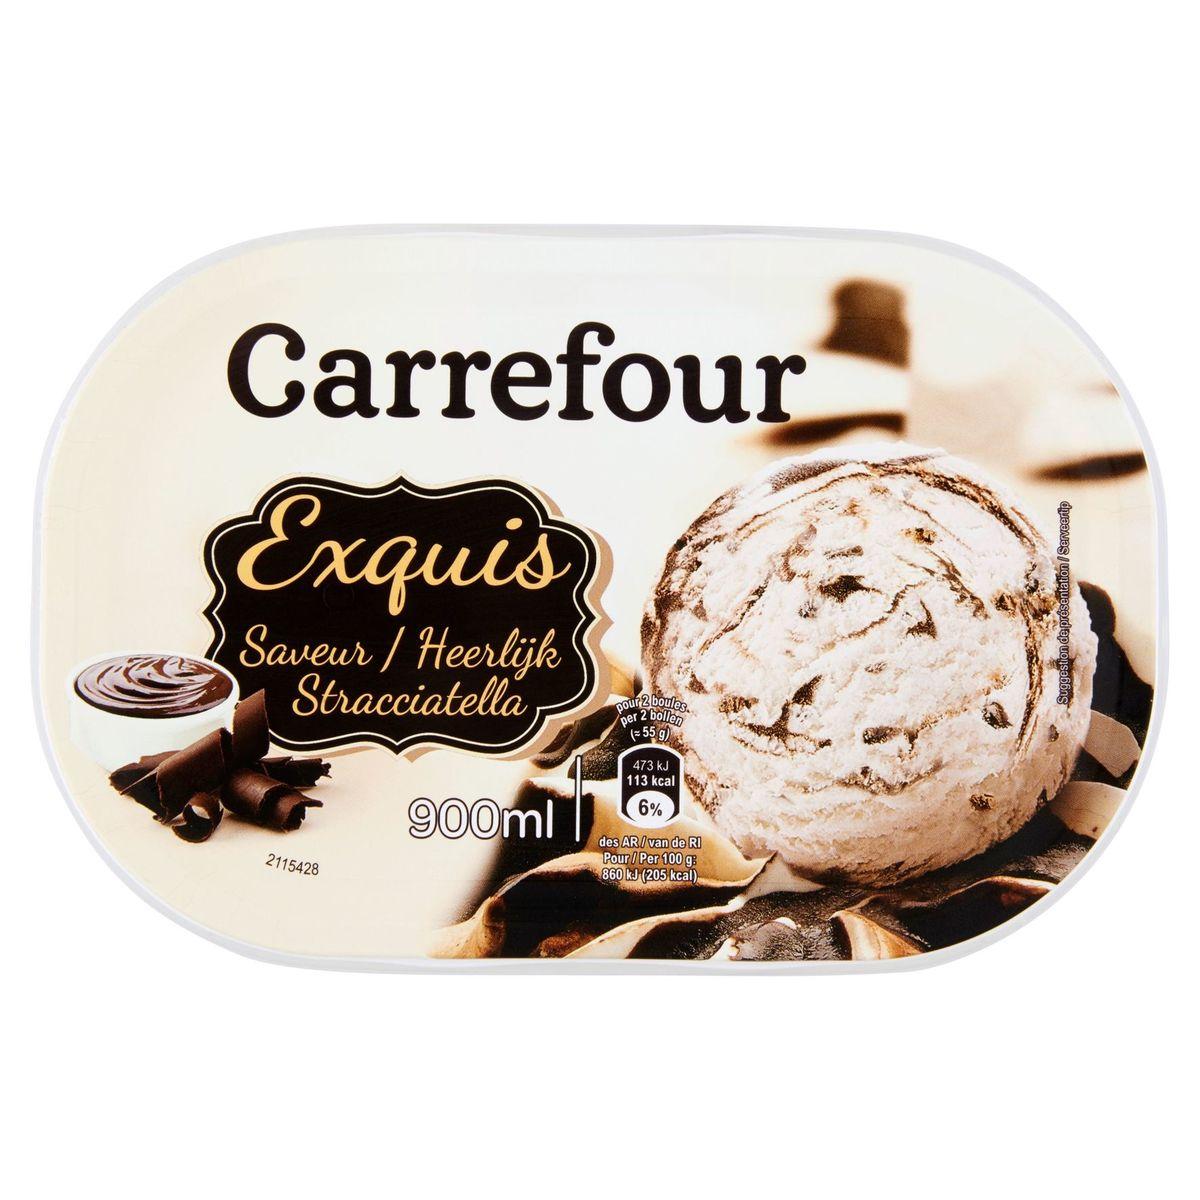 Carrefour Exquis Heerlijk Stracciatella 495 g